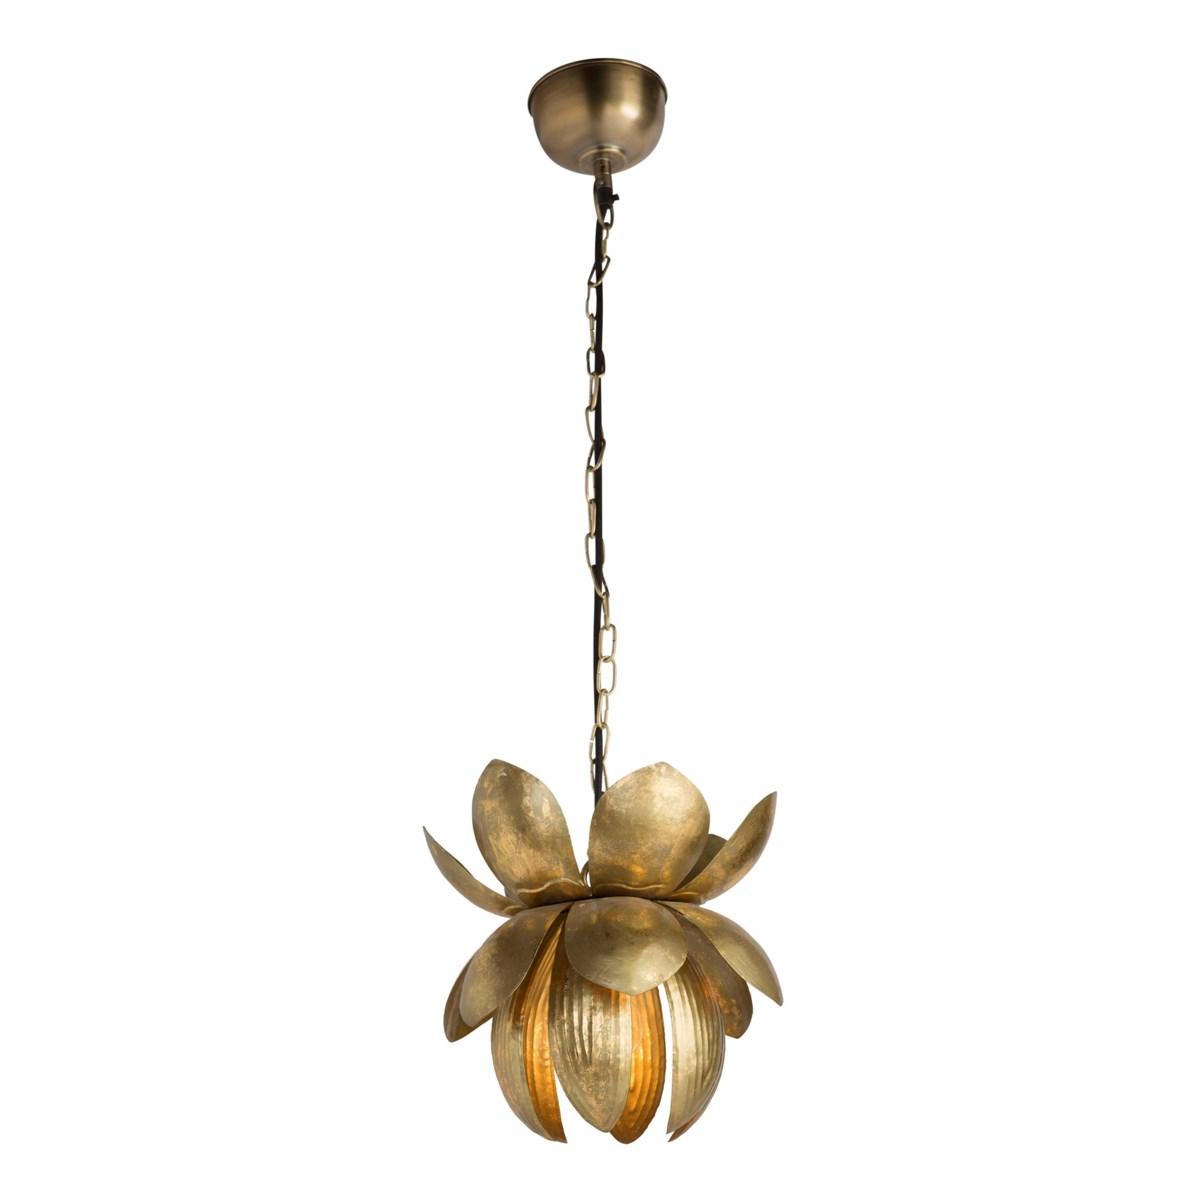 Bira Pendant - Antique Brass